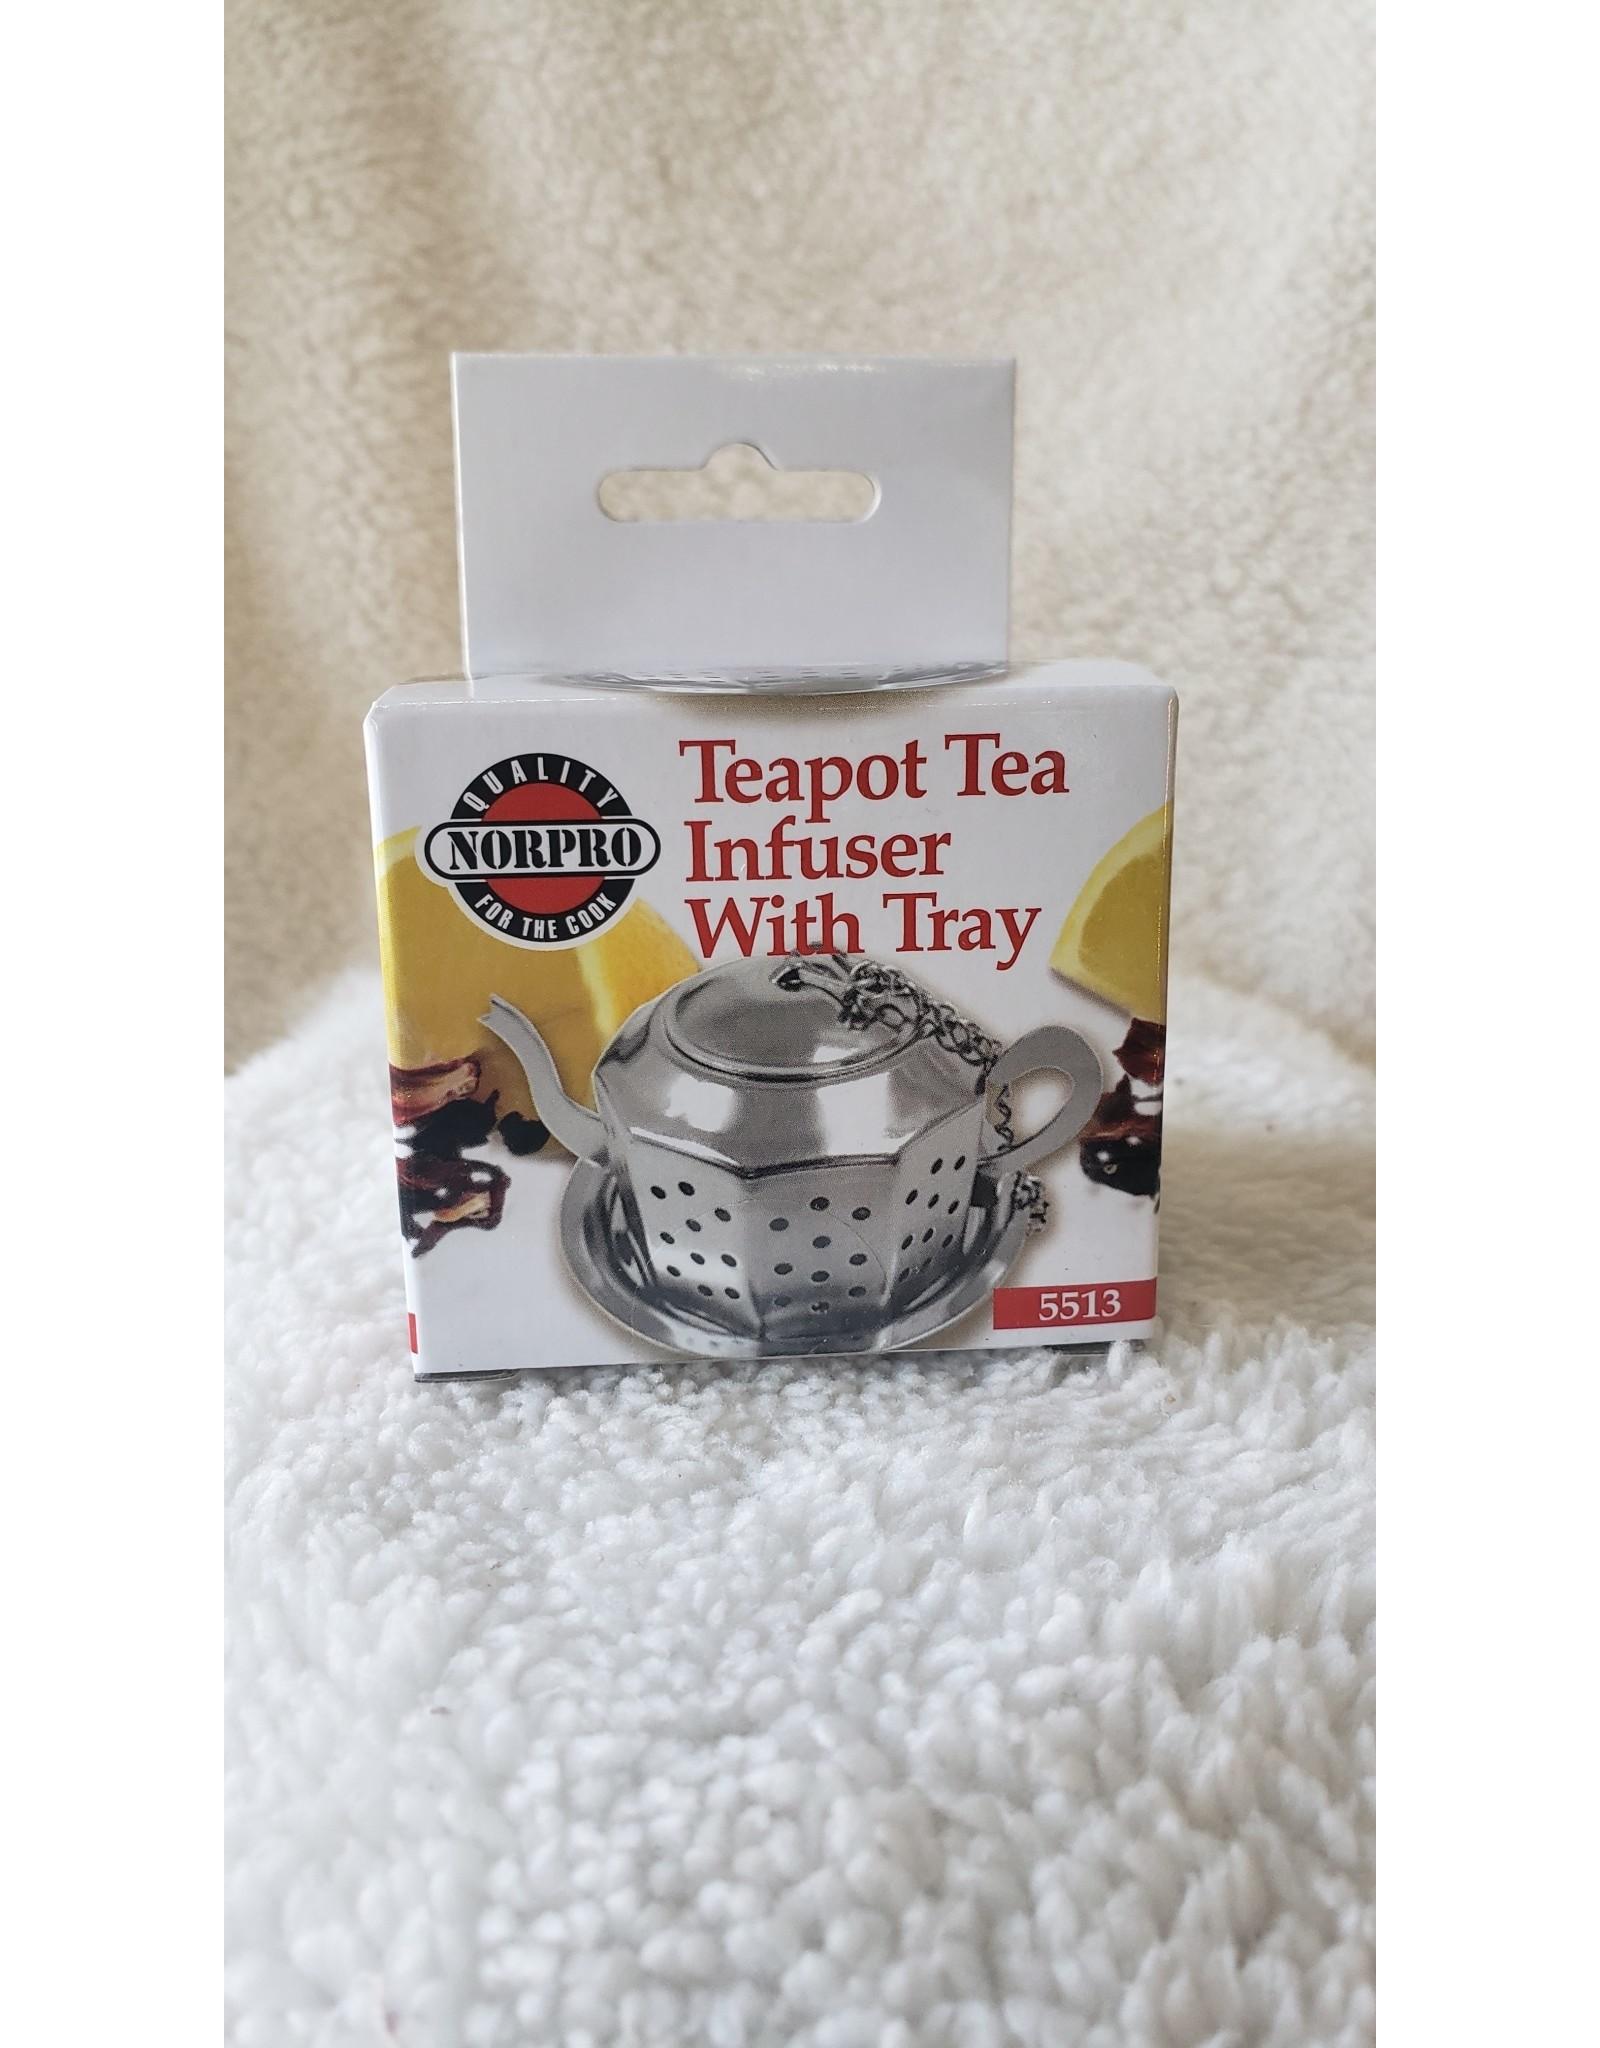 Teapot Tea Infuser w/ Tray